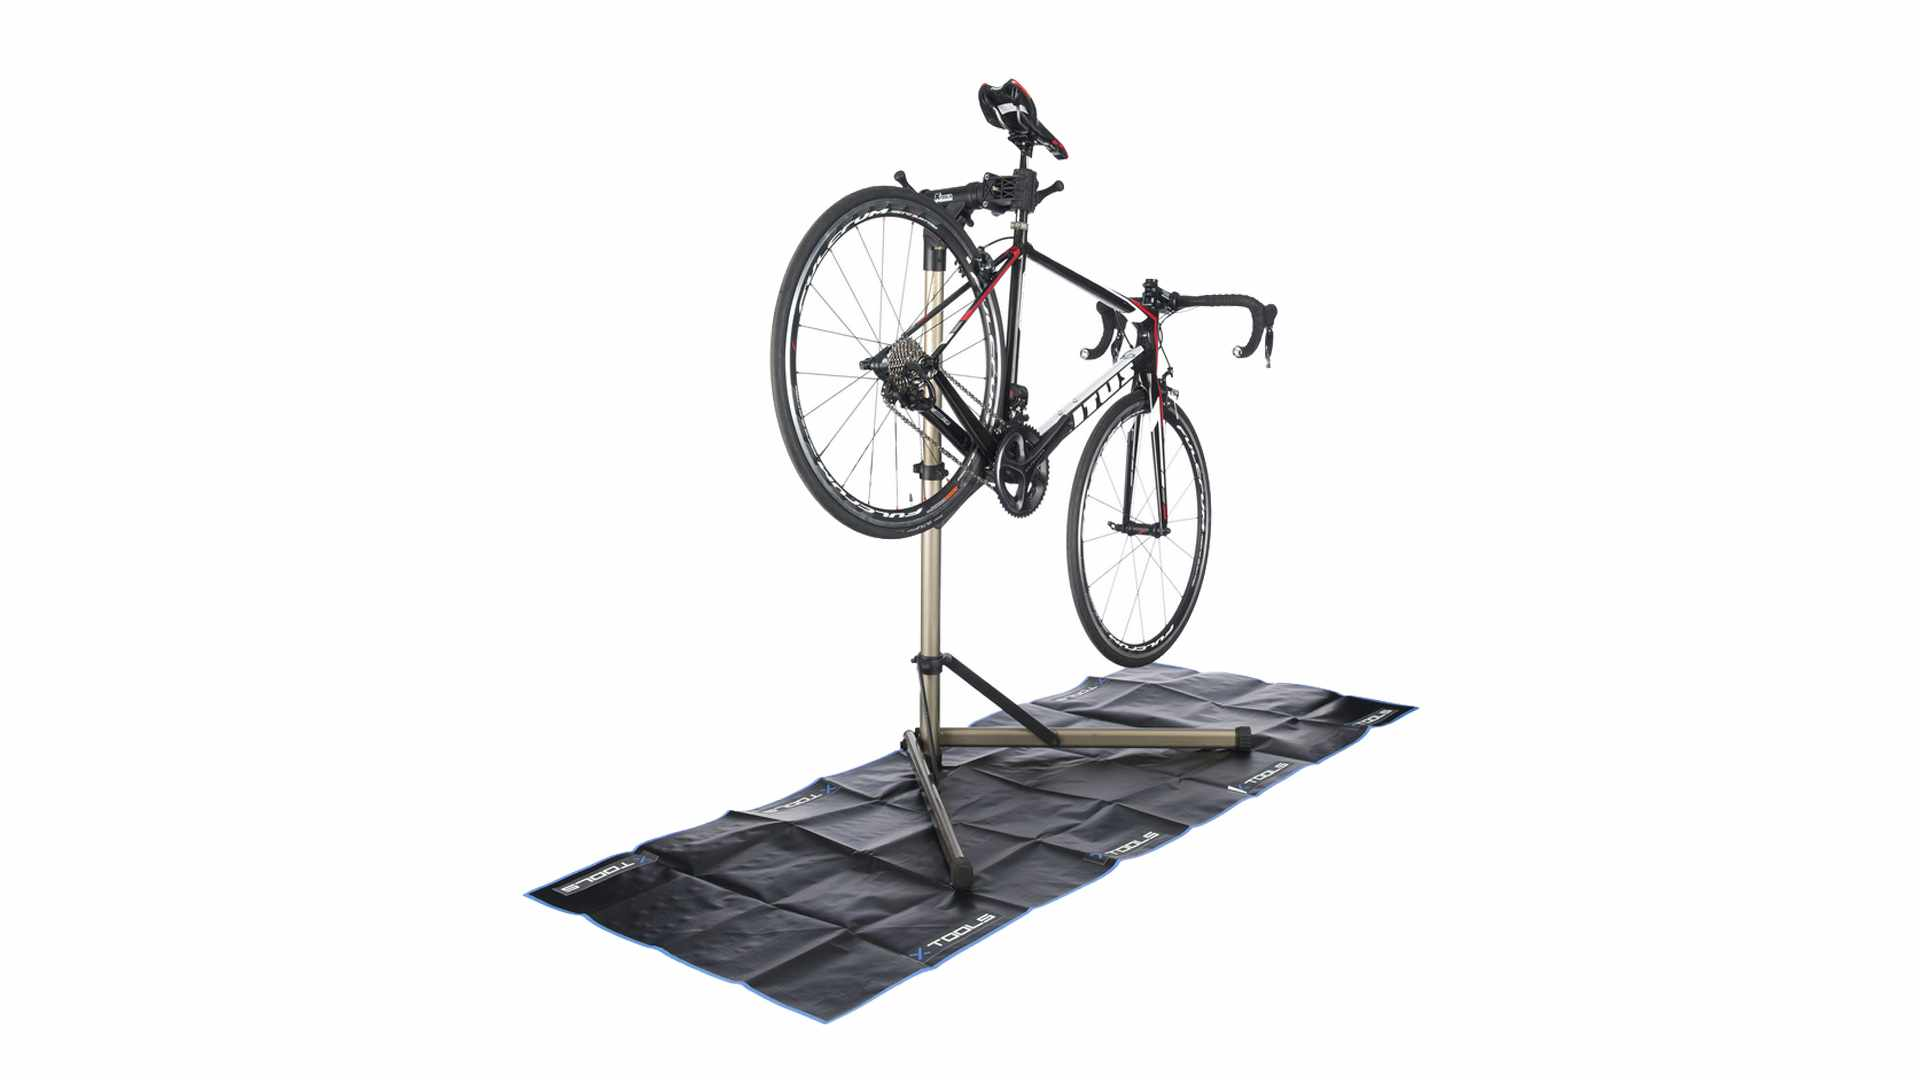 Photograph of a bike held up in a bike stand on a black matt